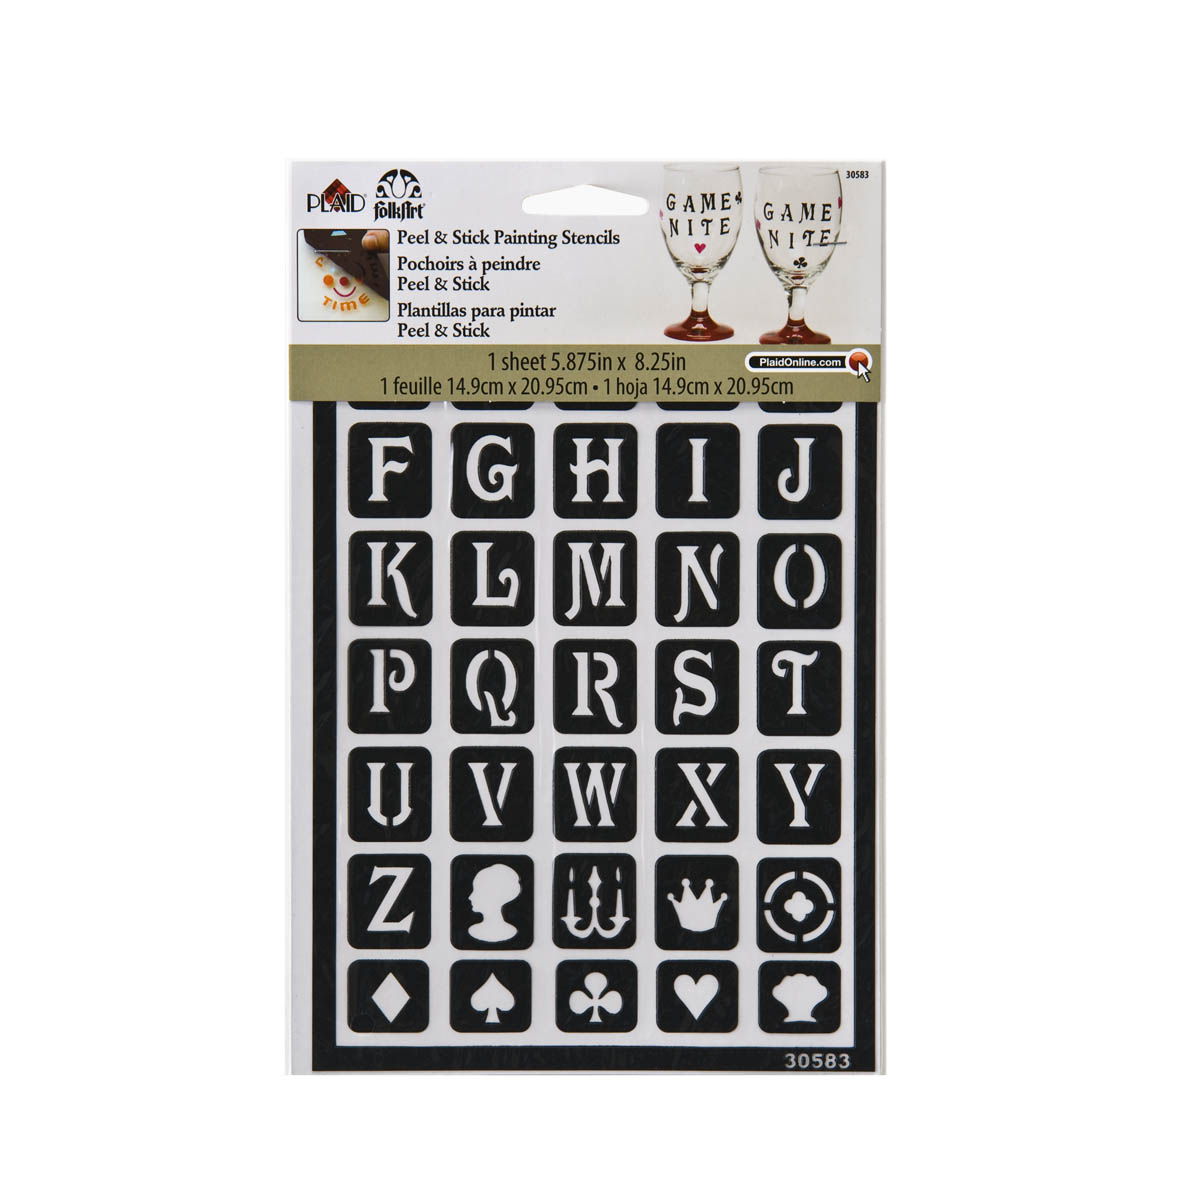 FolkArt ® Peel & Stick Painting Stencils™ - Classic Alphabet